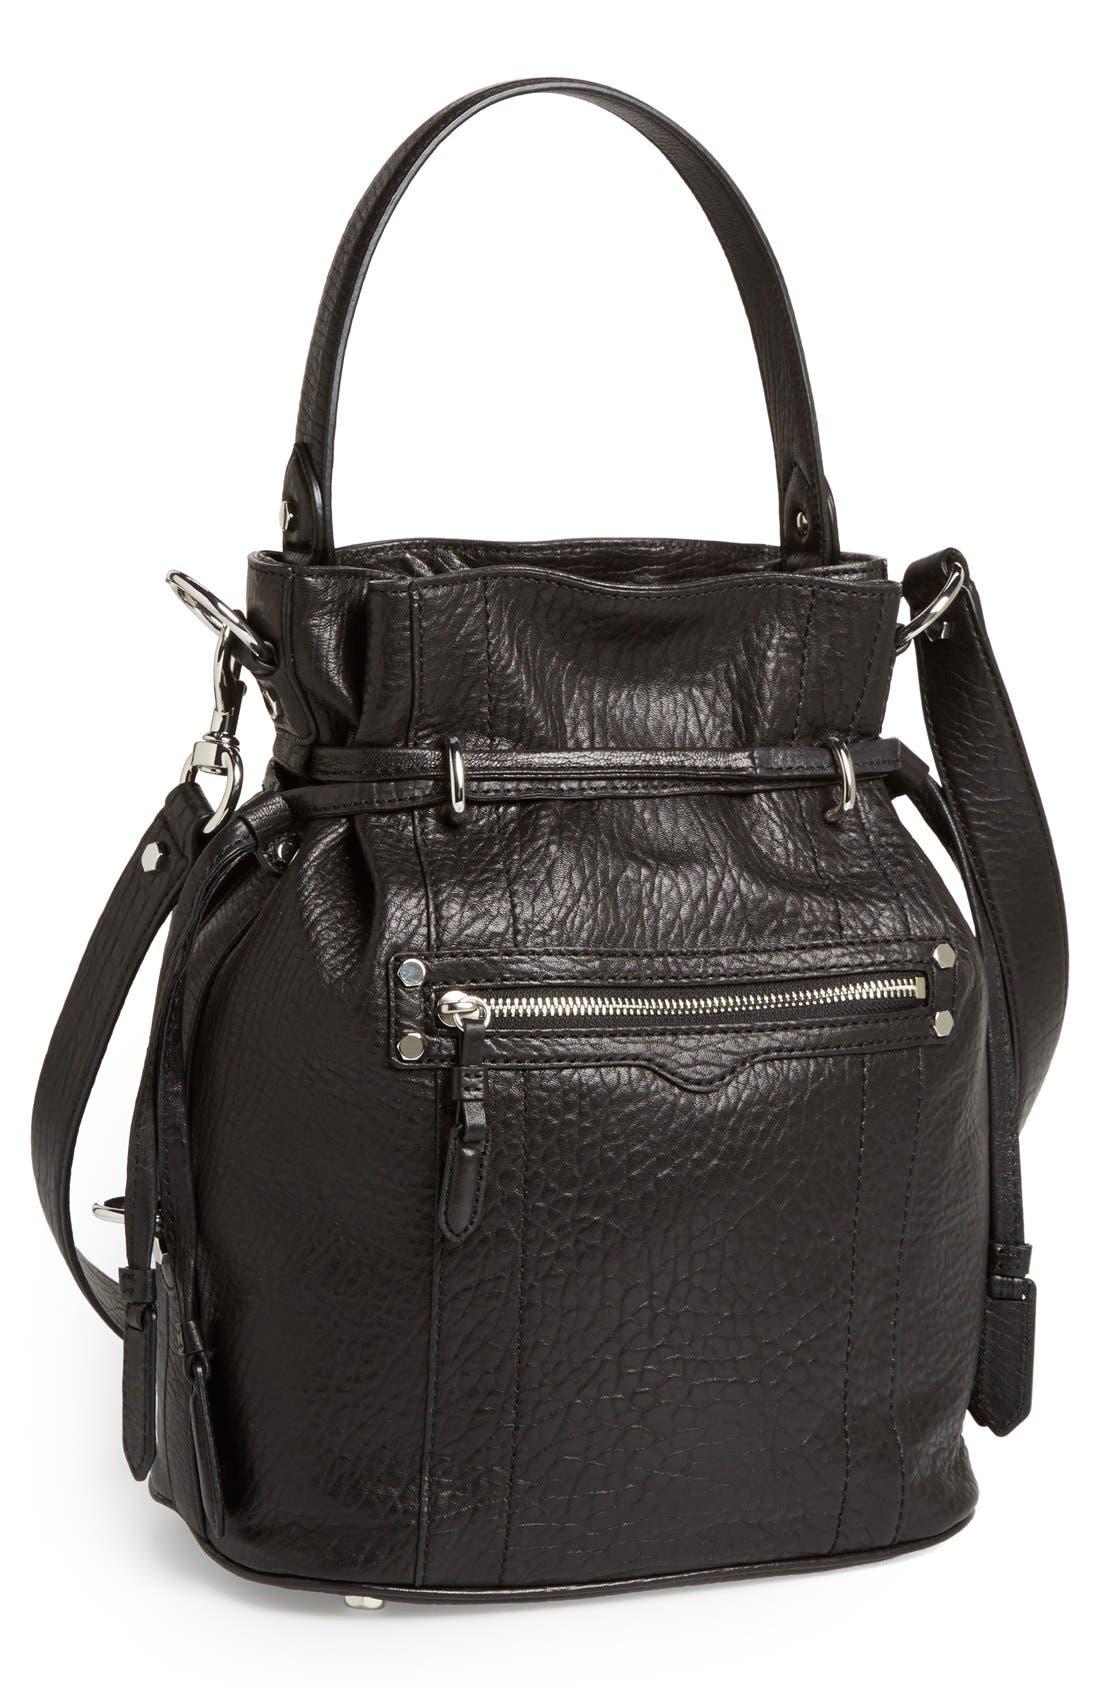 Main Image - Rebecca Minkoff 'Harley' Bucket Bag